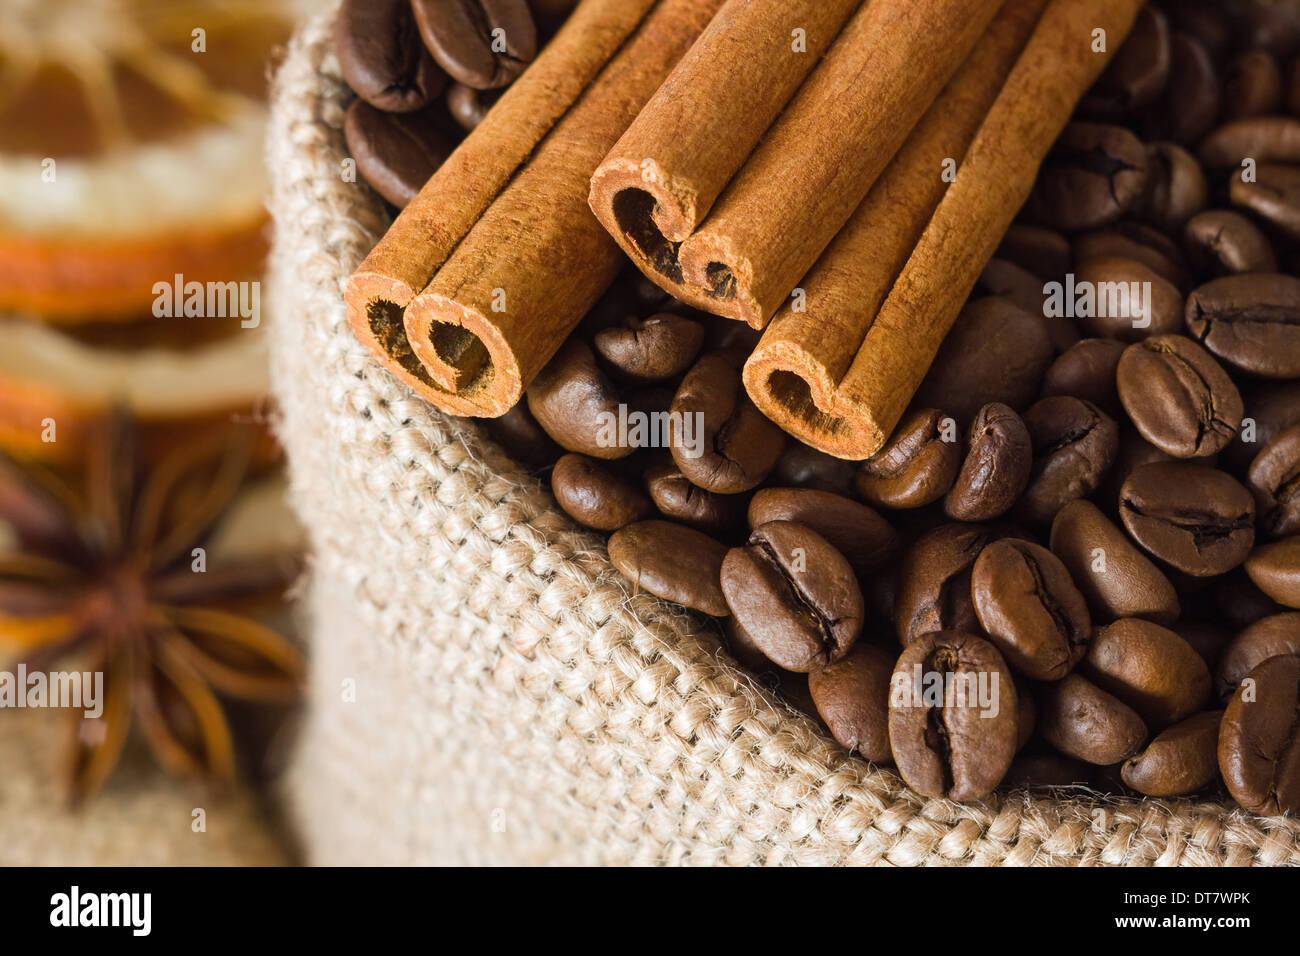 Aromatic coffee beans and cinnamon in burlap bag - Stock Image